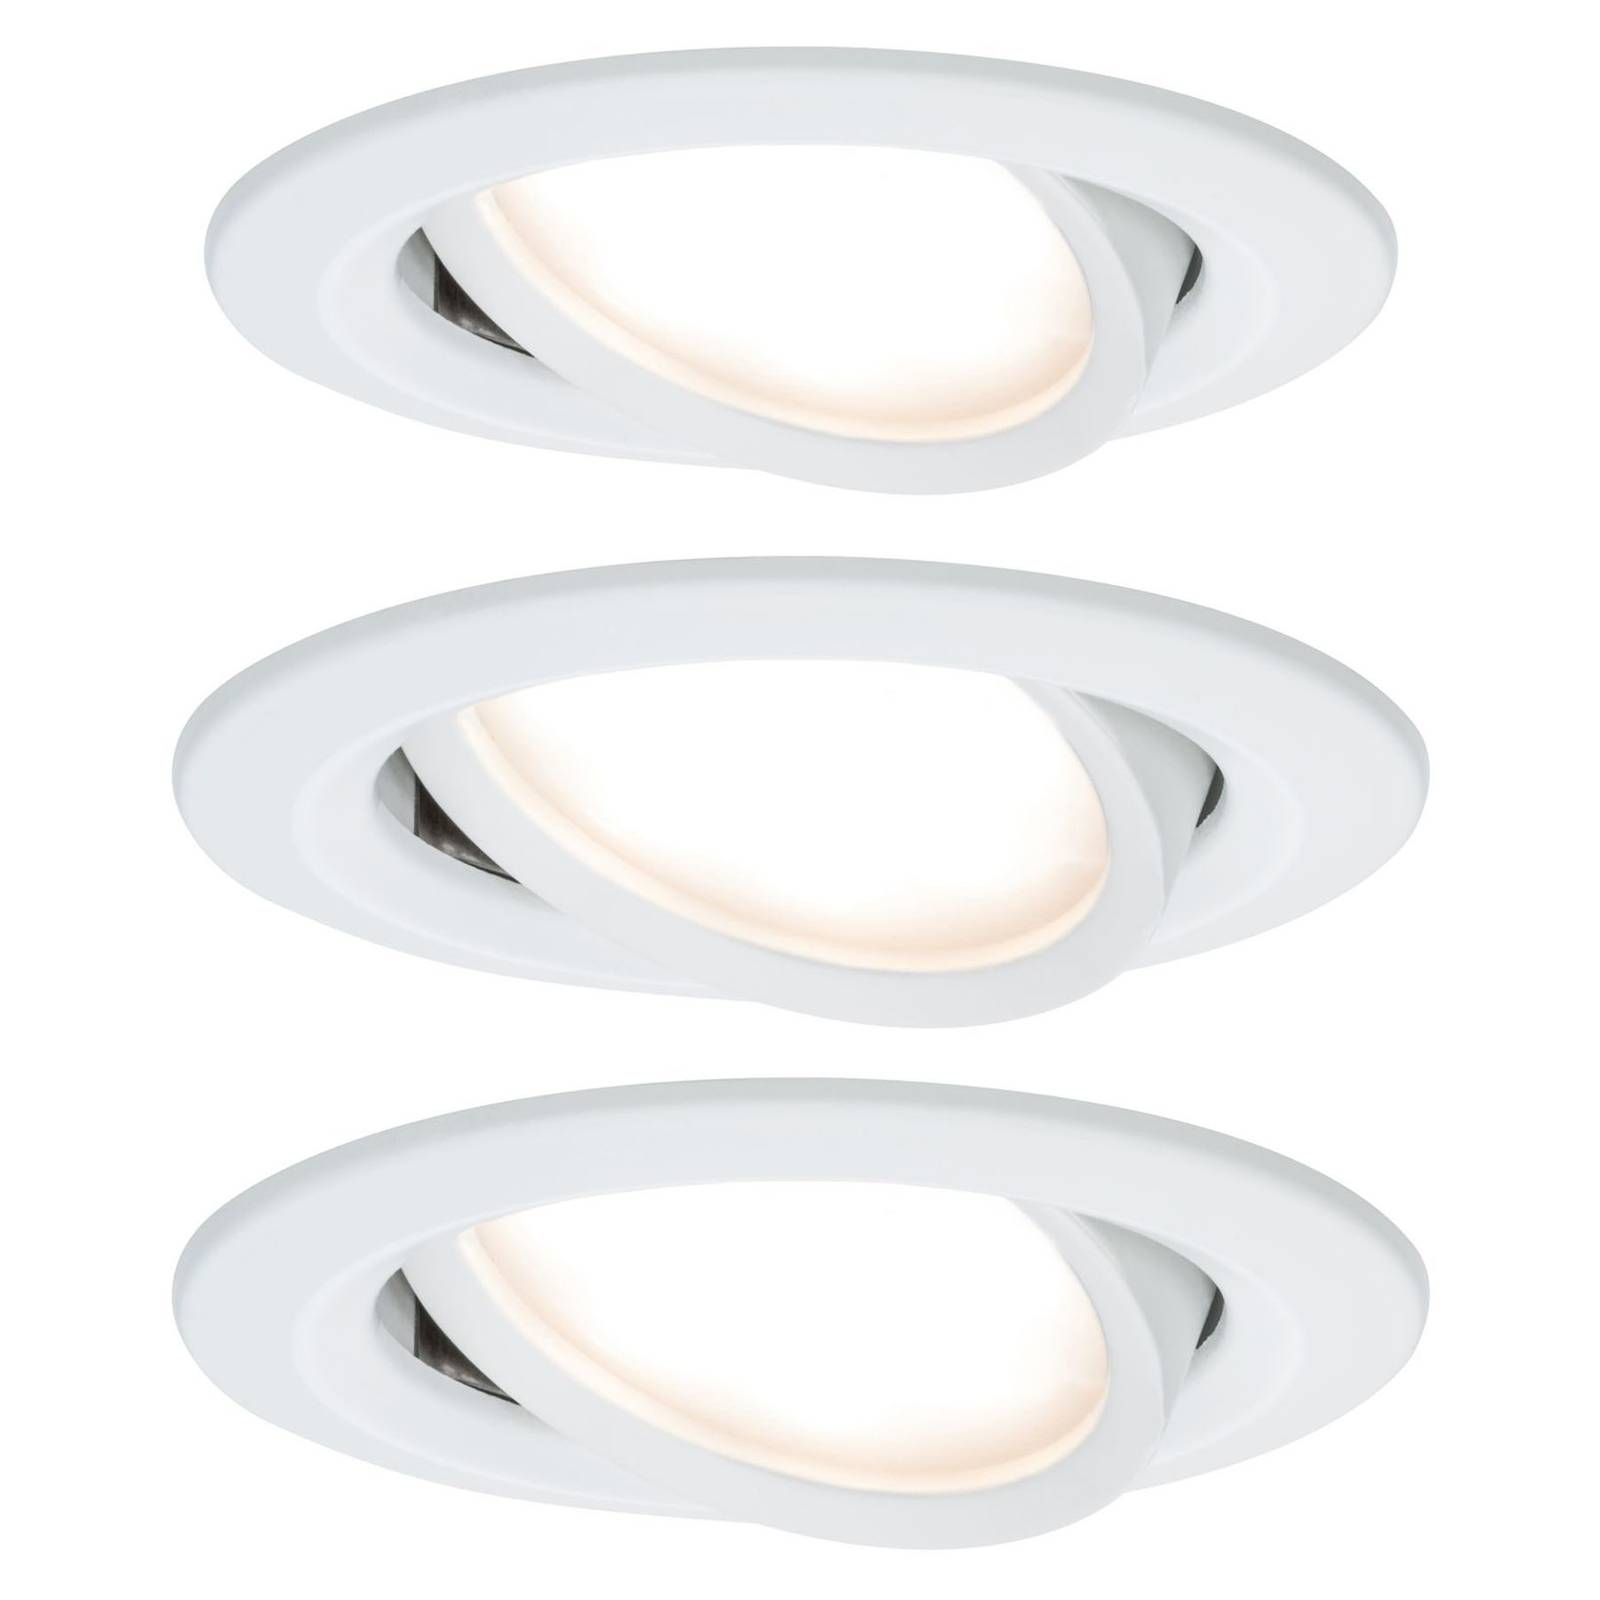 Paulmann Nova LED-kohdevalaisin, alumiini